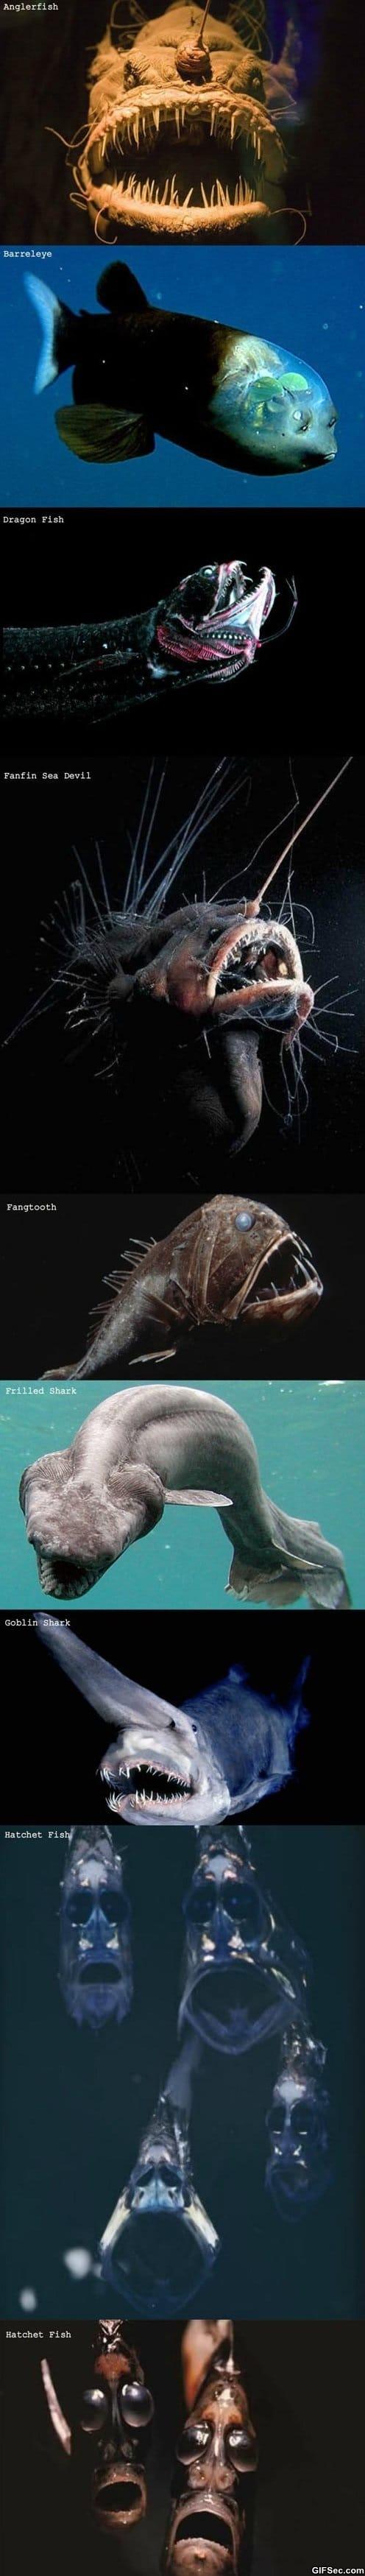 lol-strange-creatures-of-the-sea